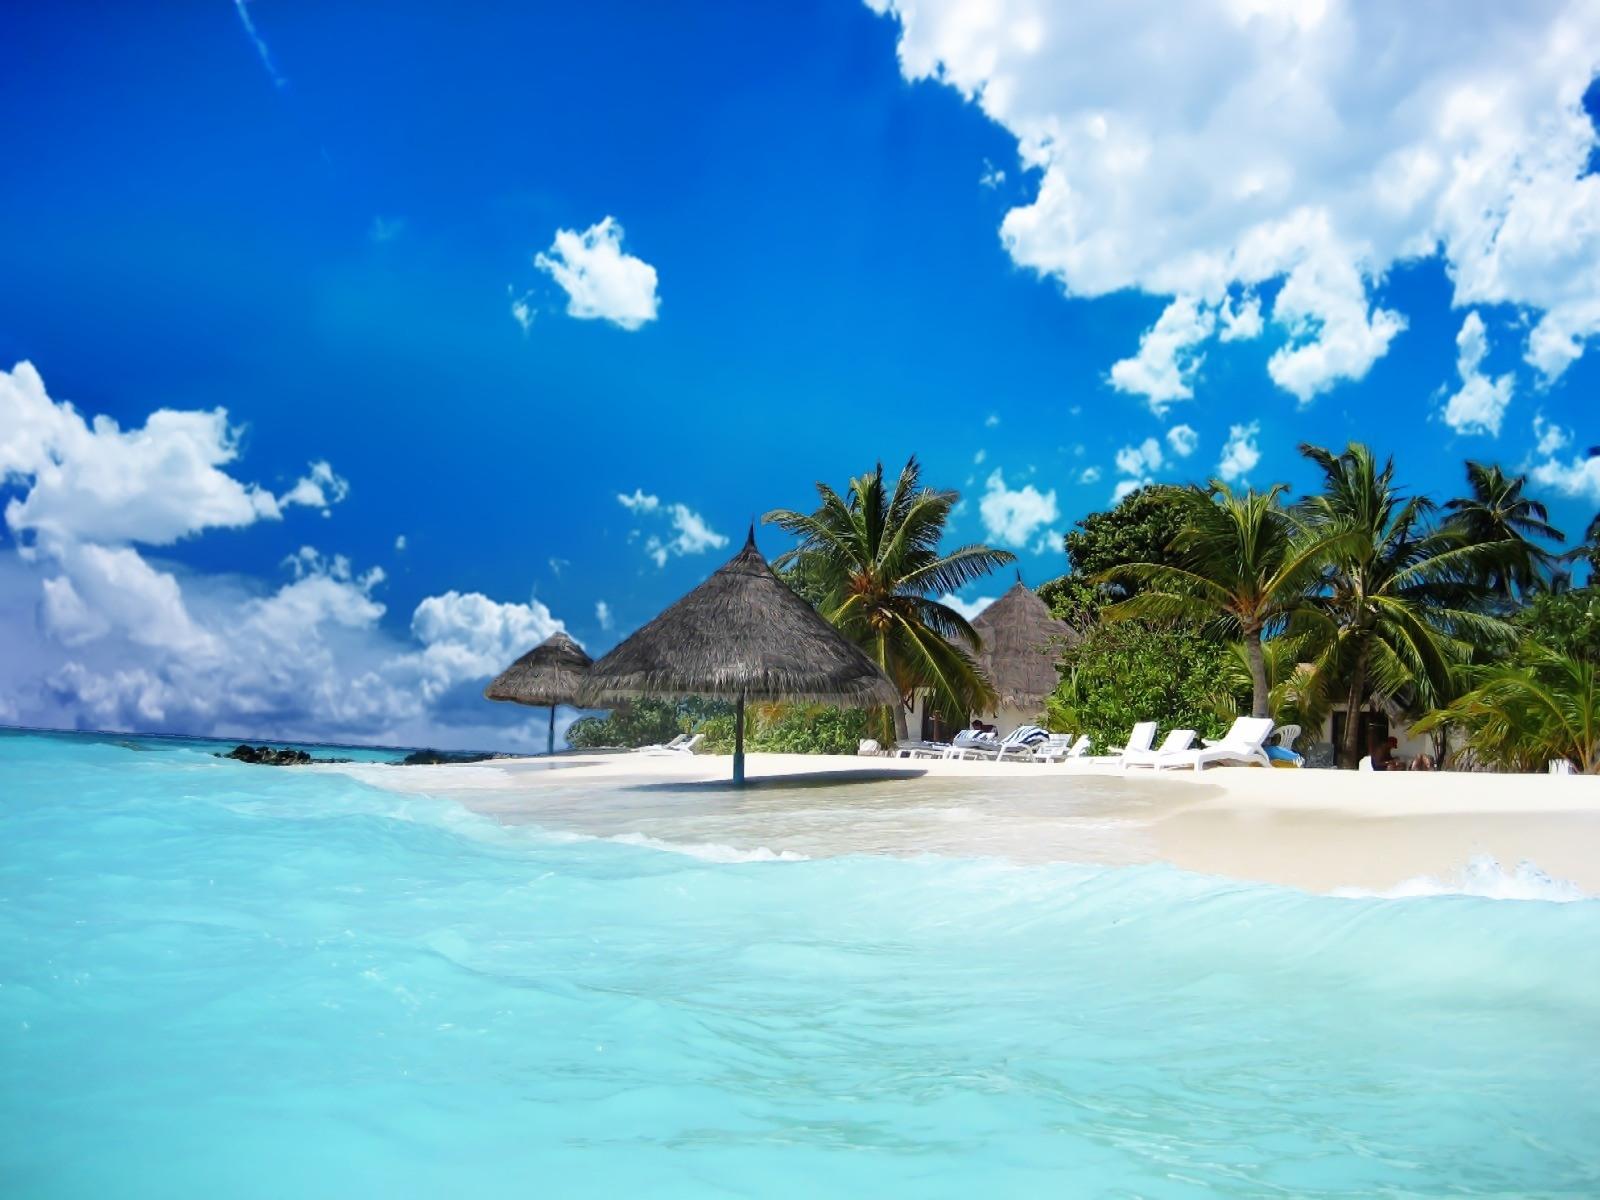 Online Wallpapers Shop Beach Wallpaper Beach Pictures Backgrounds 1600x1200